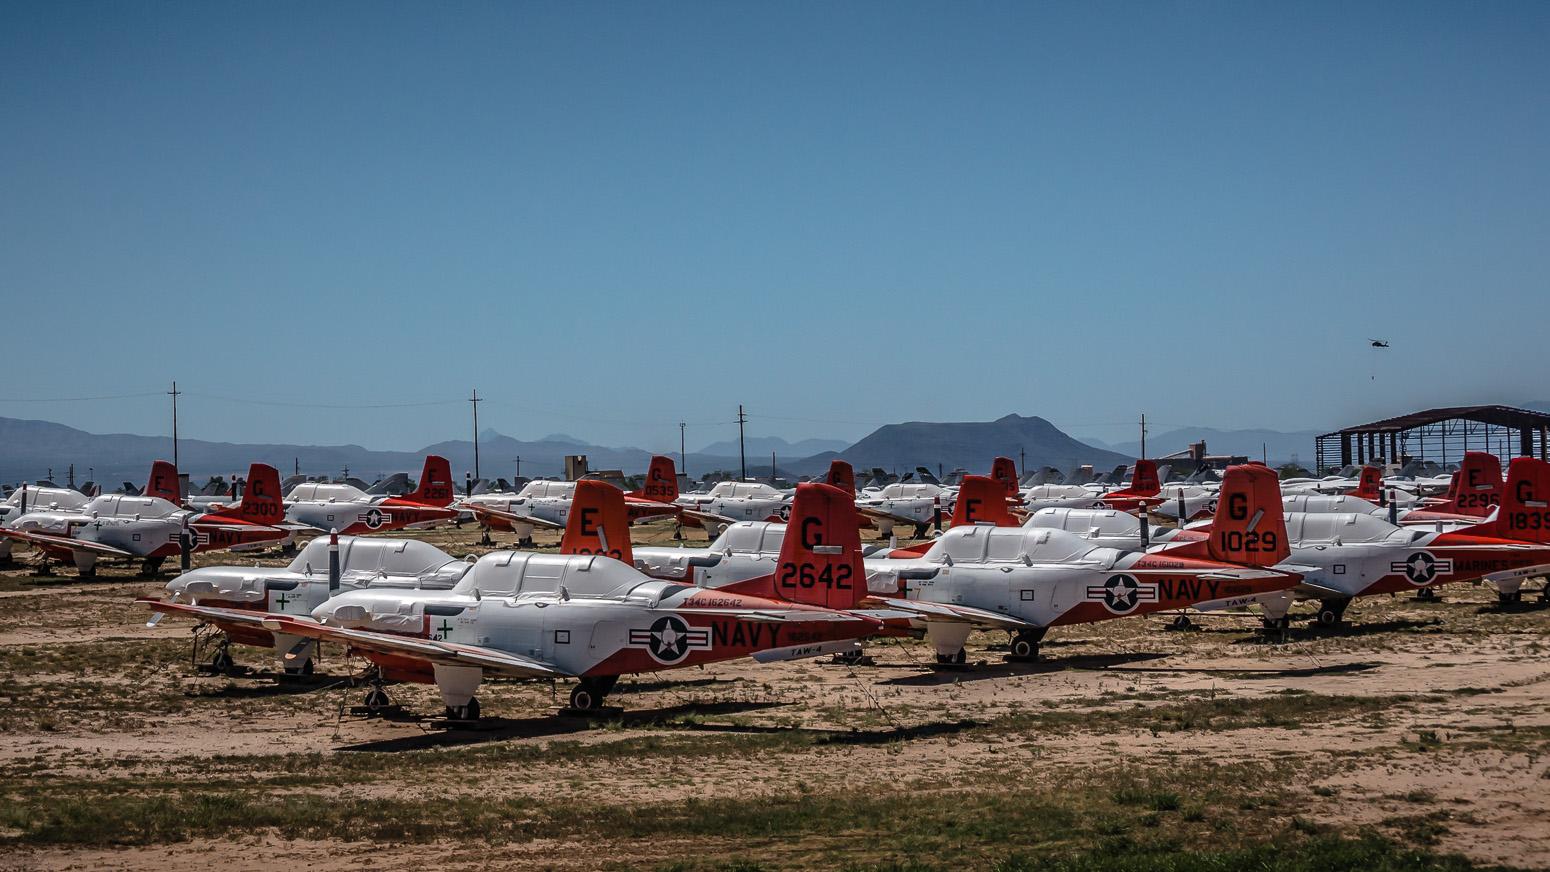 Beech T-34C, The Boneyard, Davis-Monthan Air Force Base, Tucson, USA